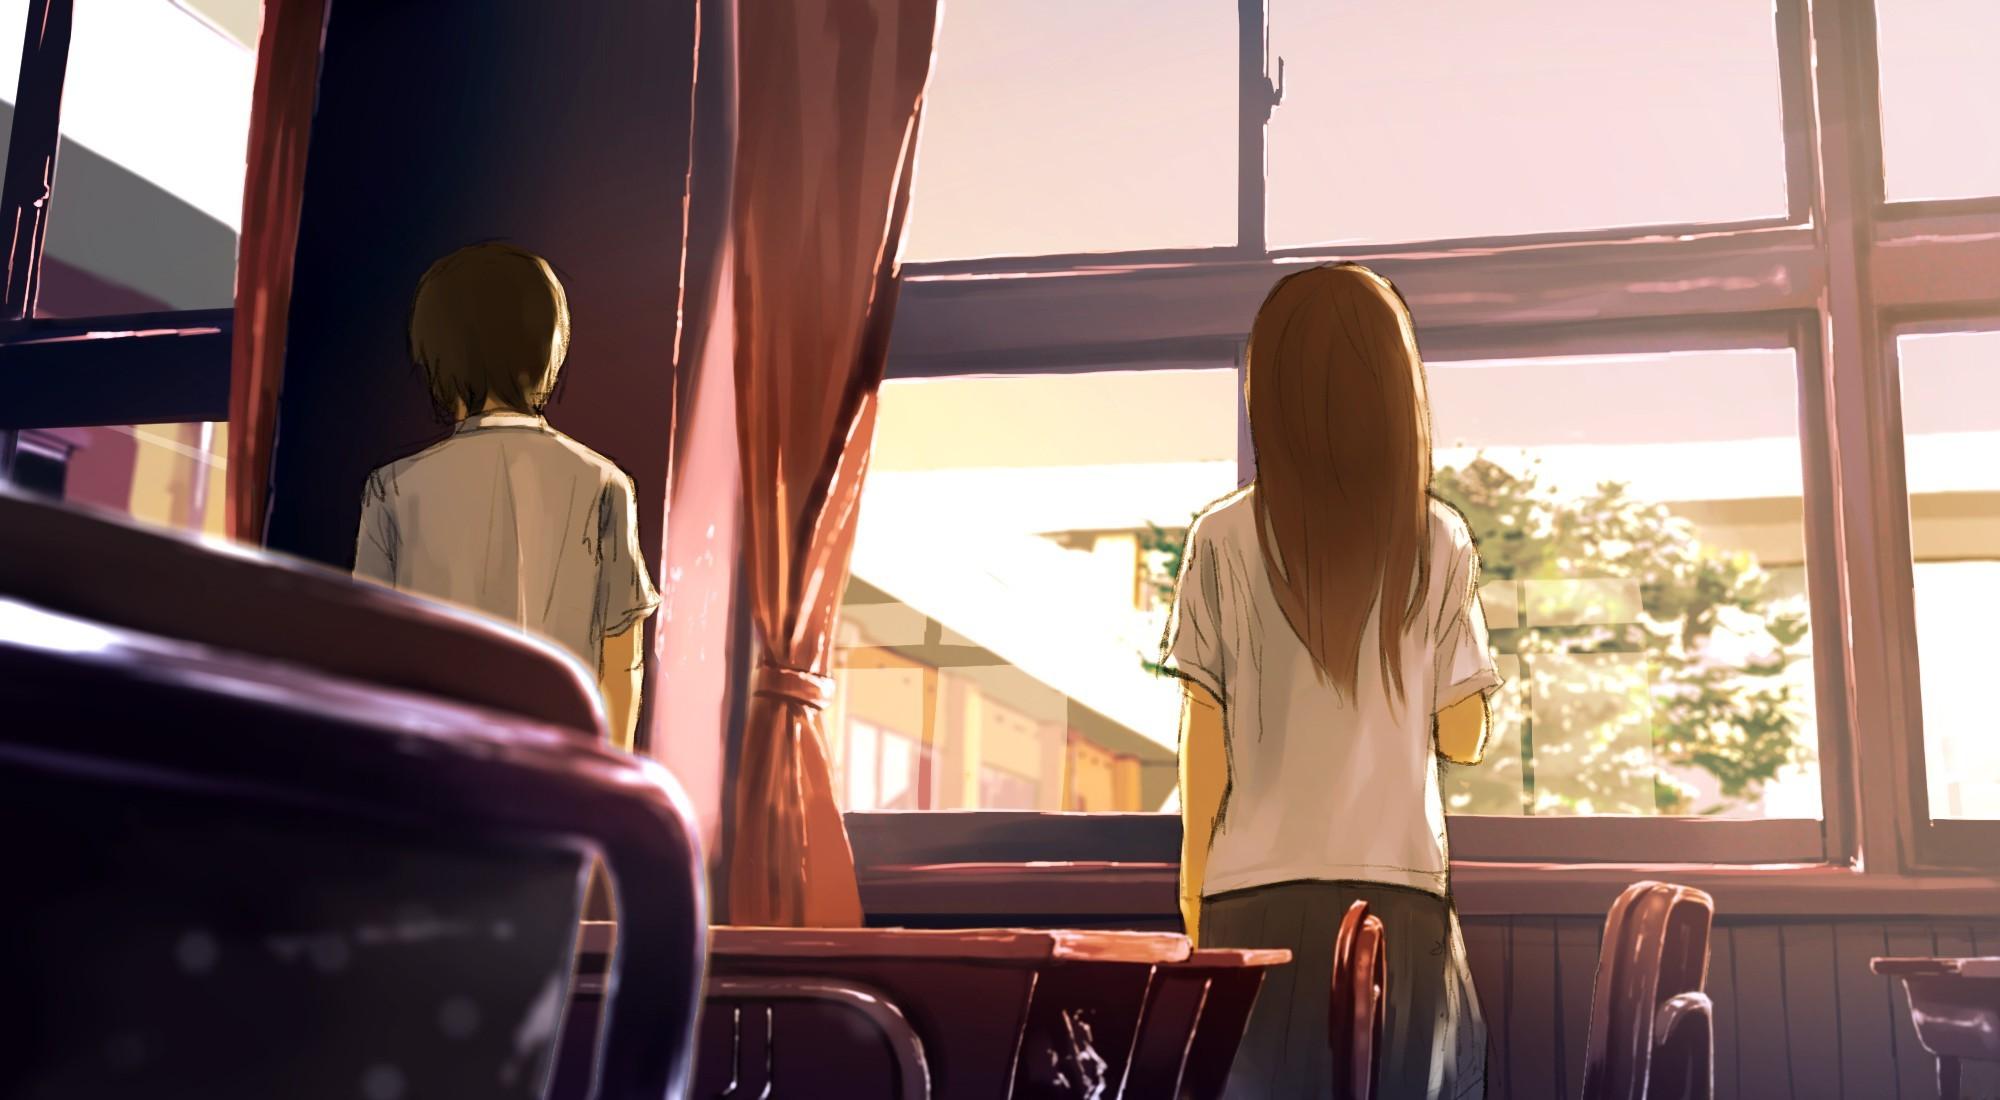 67 wallpaper anime classroom pic best wallpaper hd